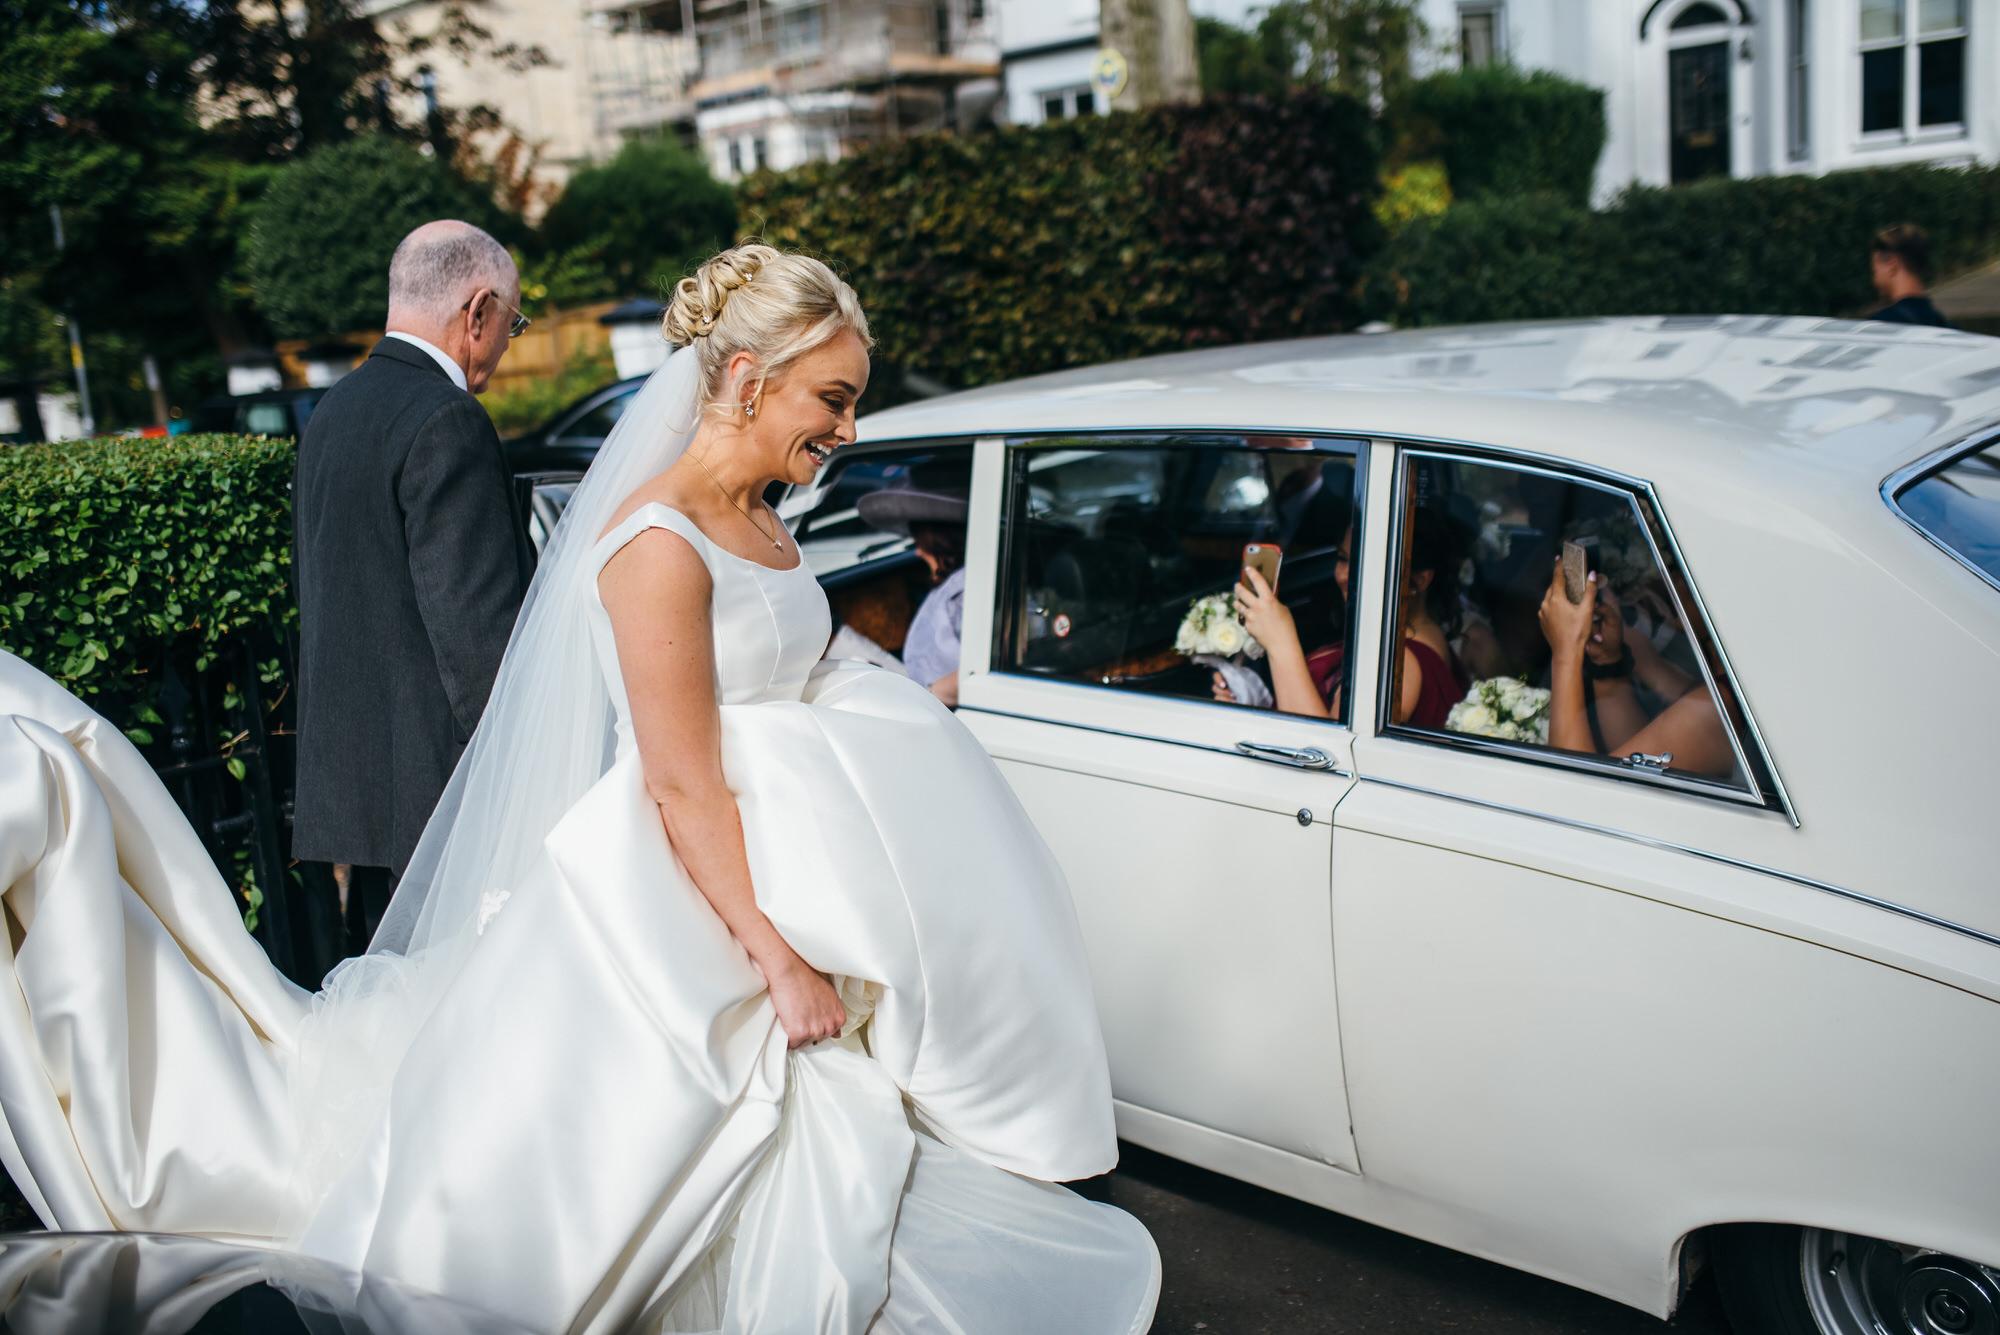 Merrydale manor wedding photography 027